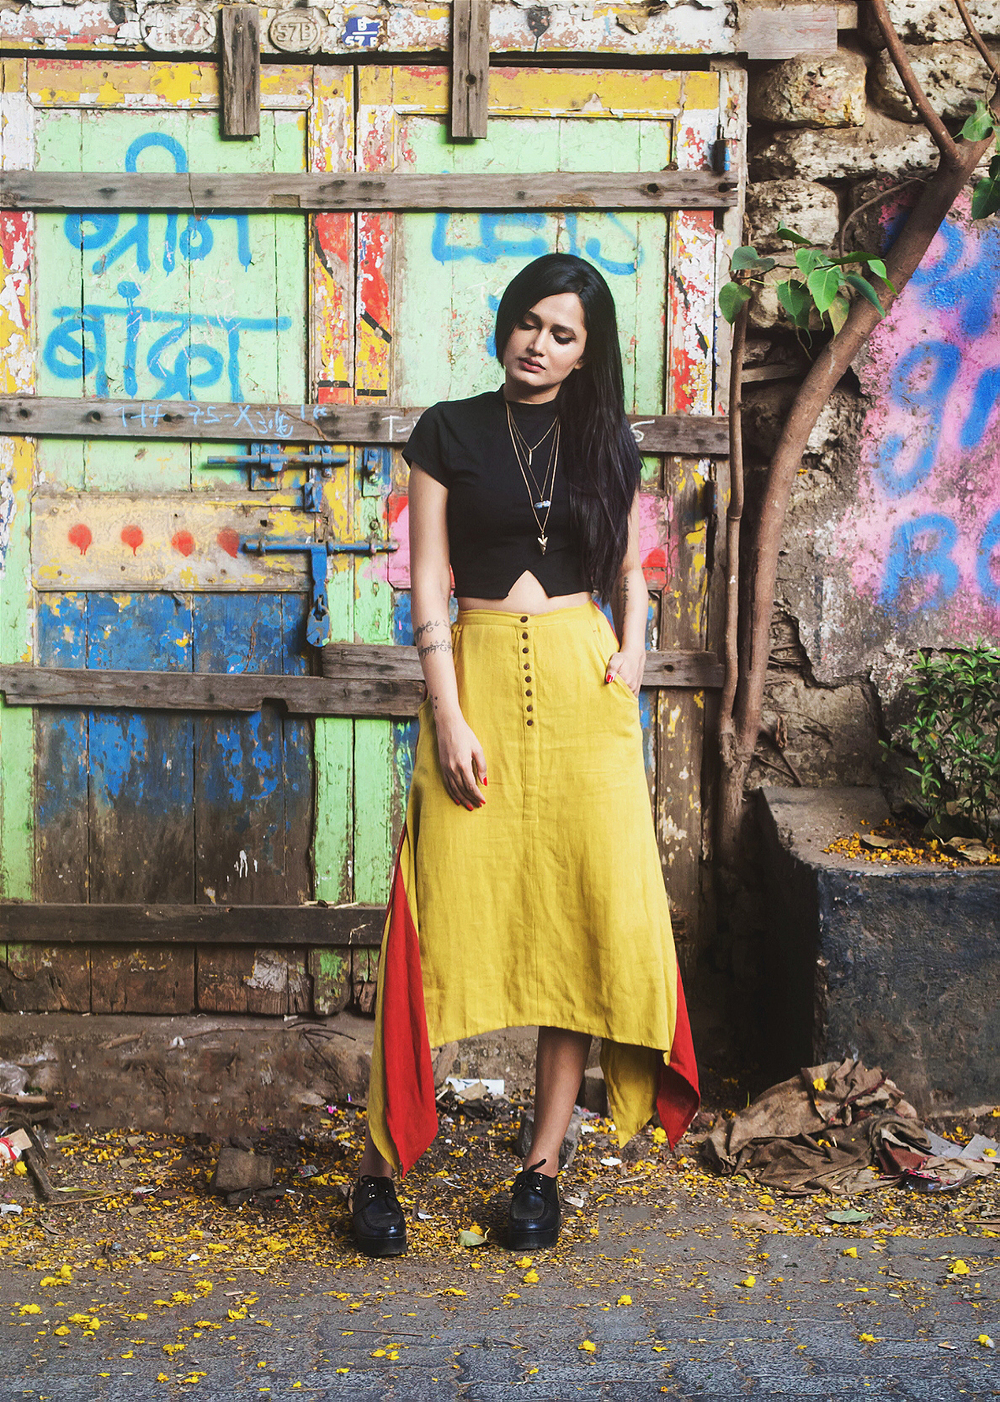 The-Chic-Armoire-by-Nidhi-Kunder-Jayati-Goenka-5